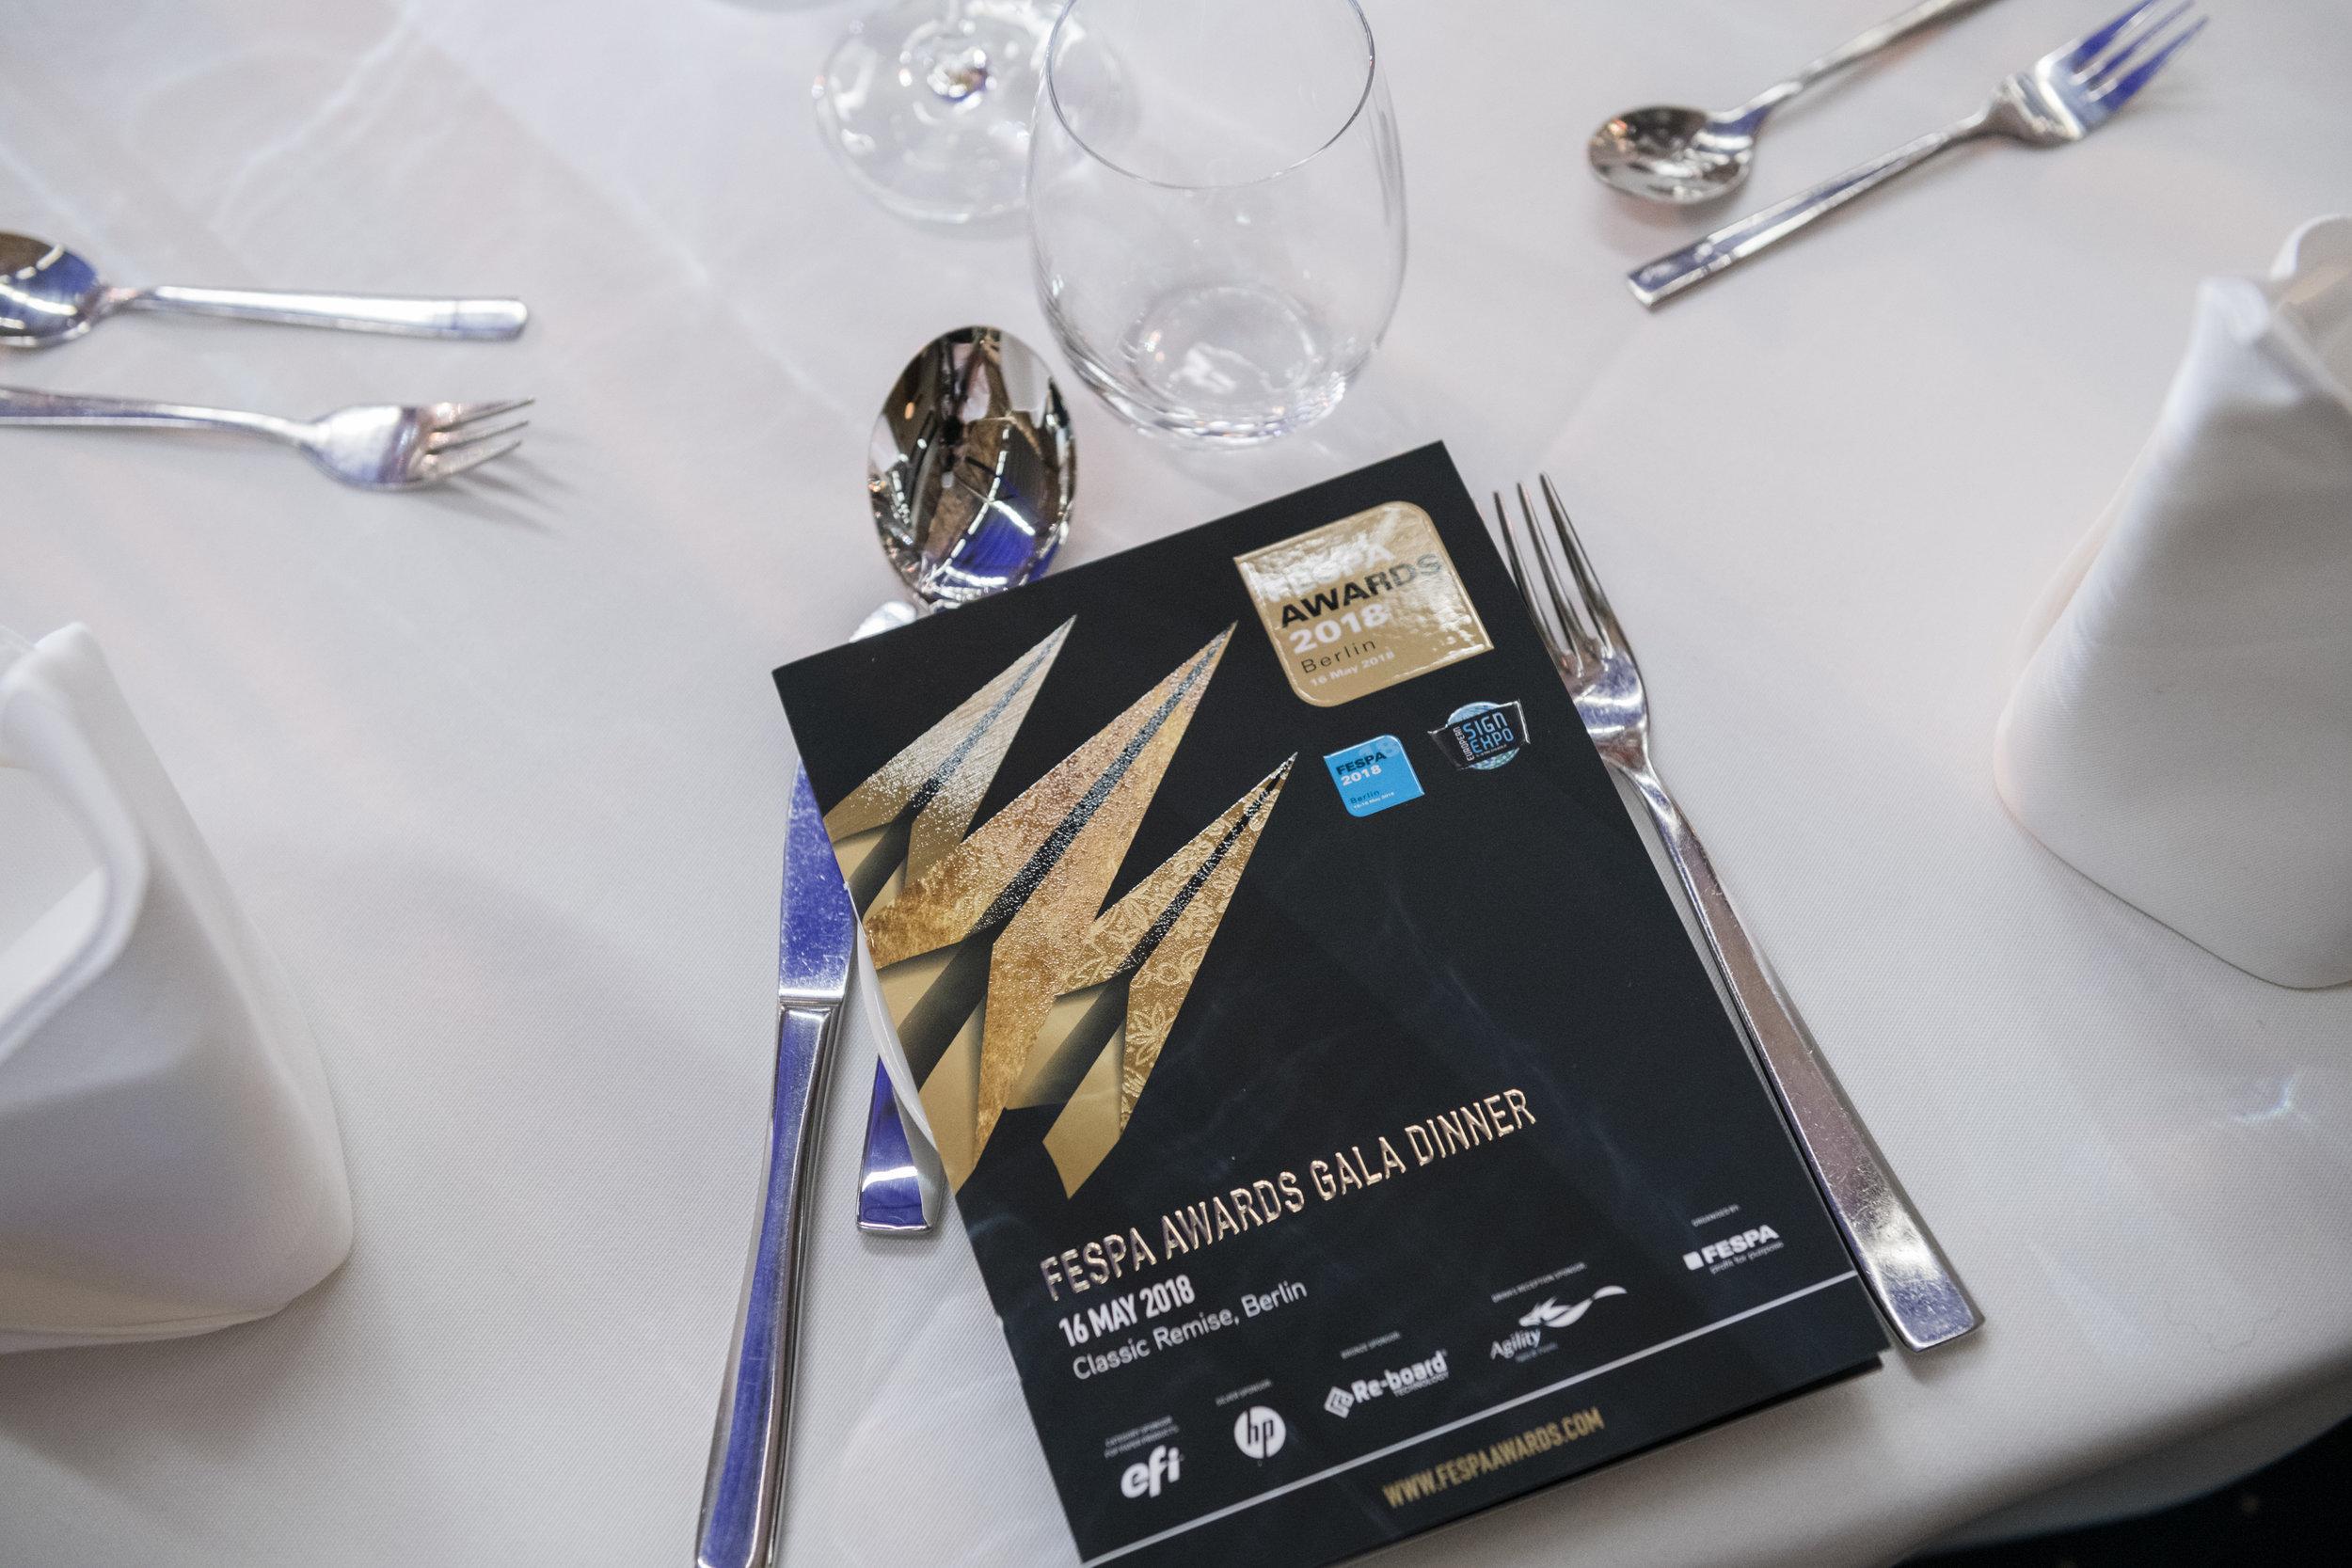 2018-05-16_FESPA_Awards_0001.jpg